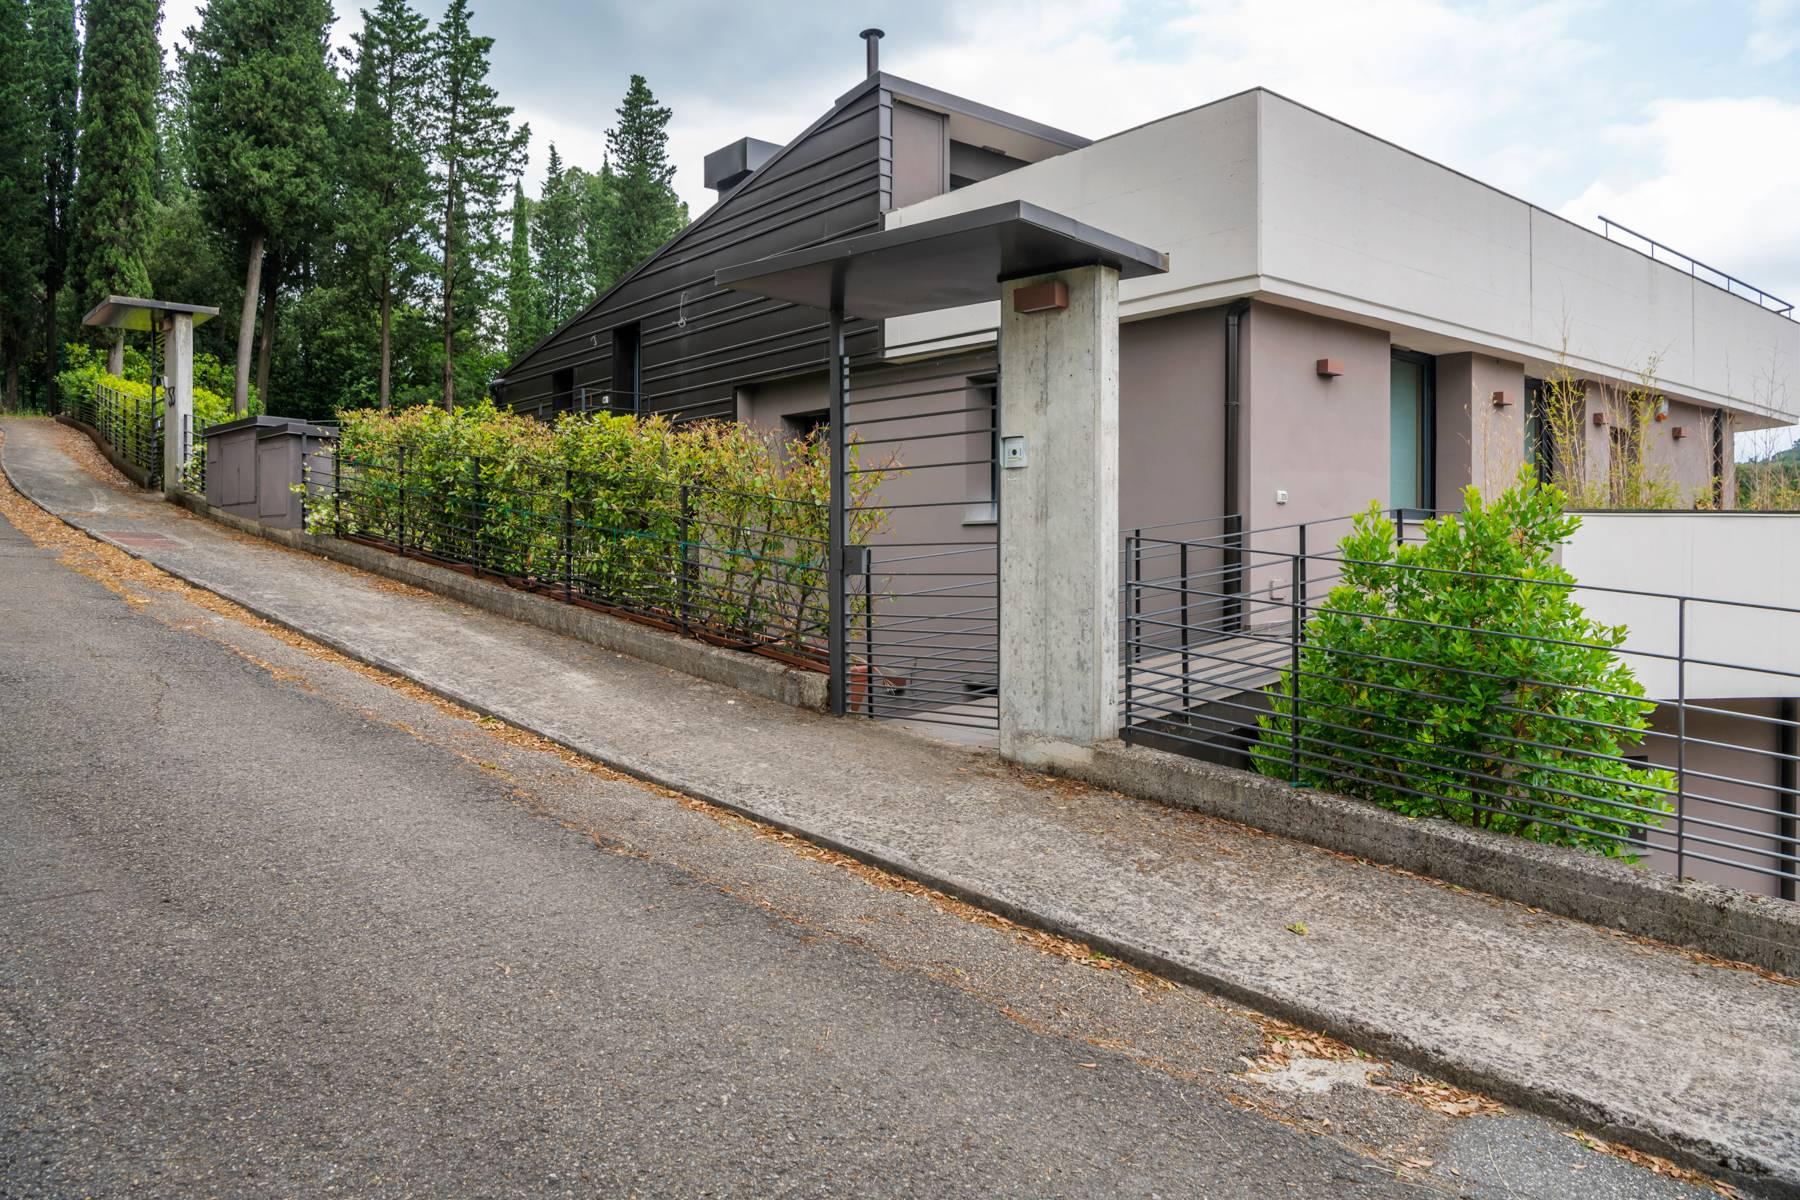 Appartamento in Vendita a Pontassieve: 5 locali, 300 mq - Foto 20